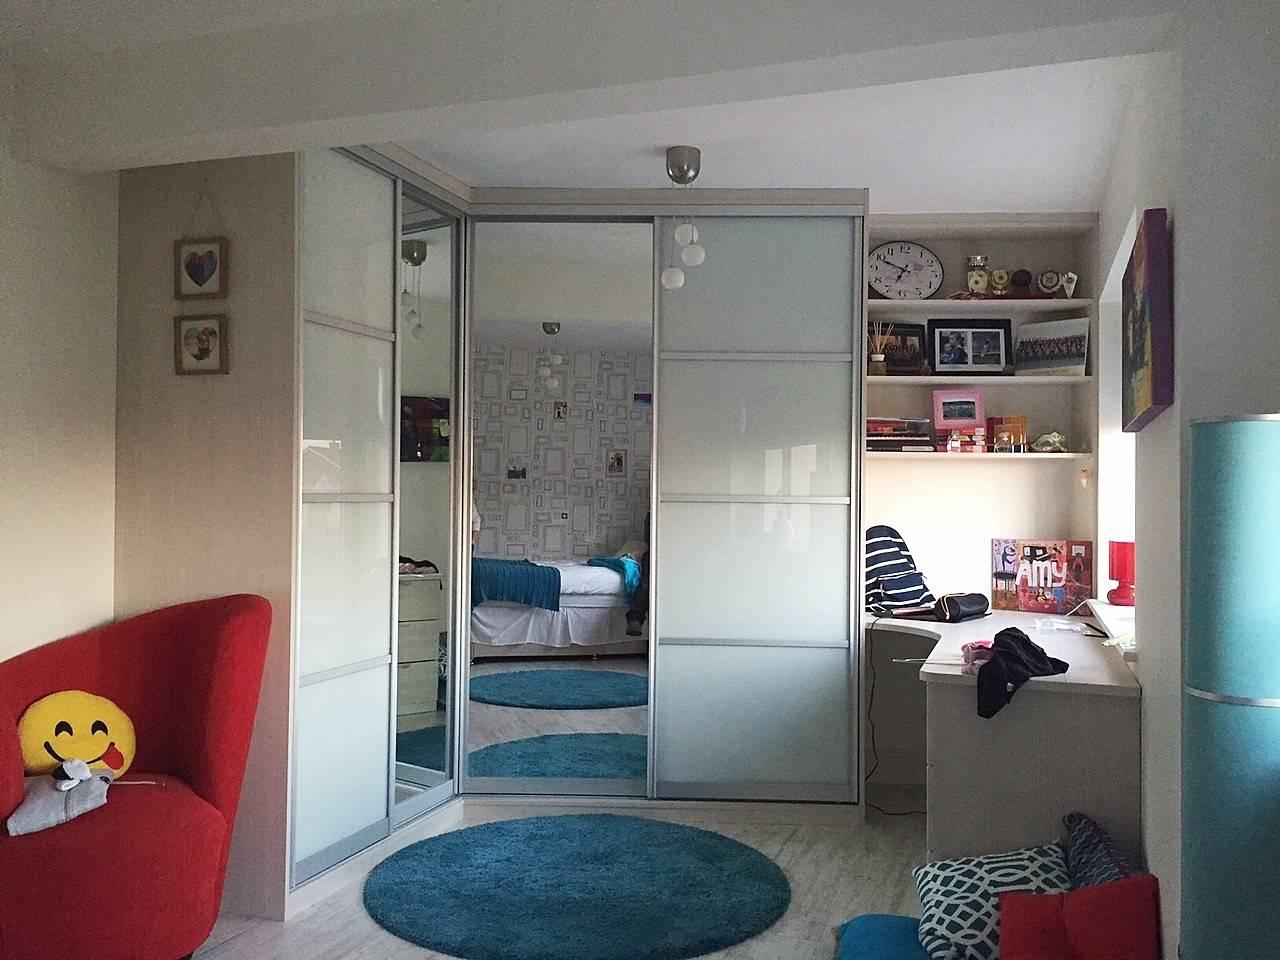 Corner Robe With Desk | Slideglide - Sliding Wardrobes And Storage inside Curved Wardrobe Doors (Image 9 of 30)